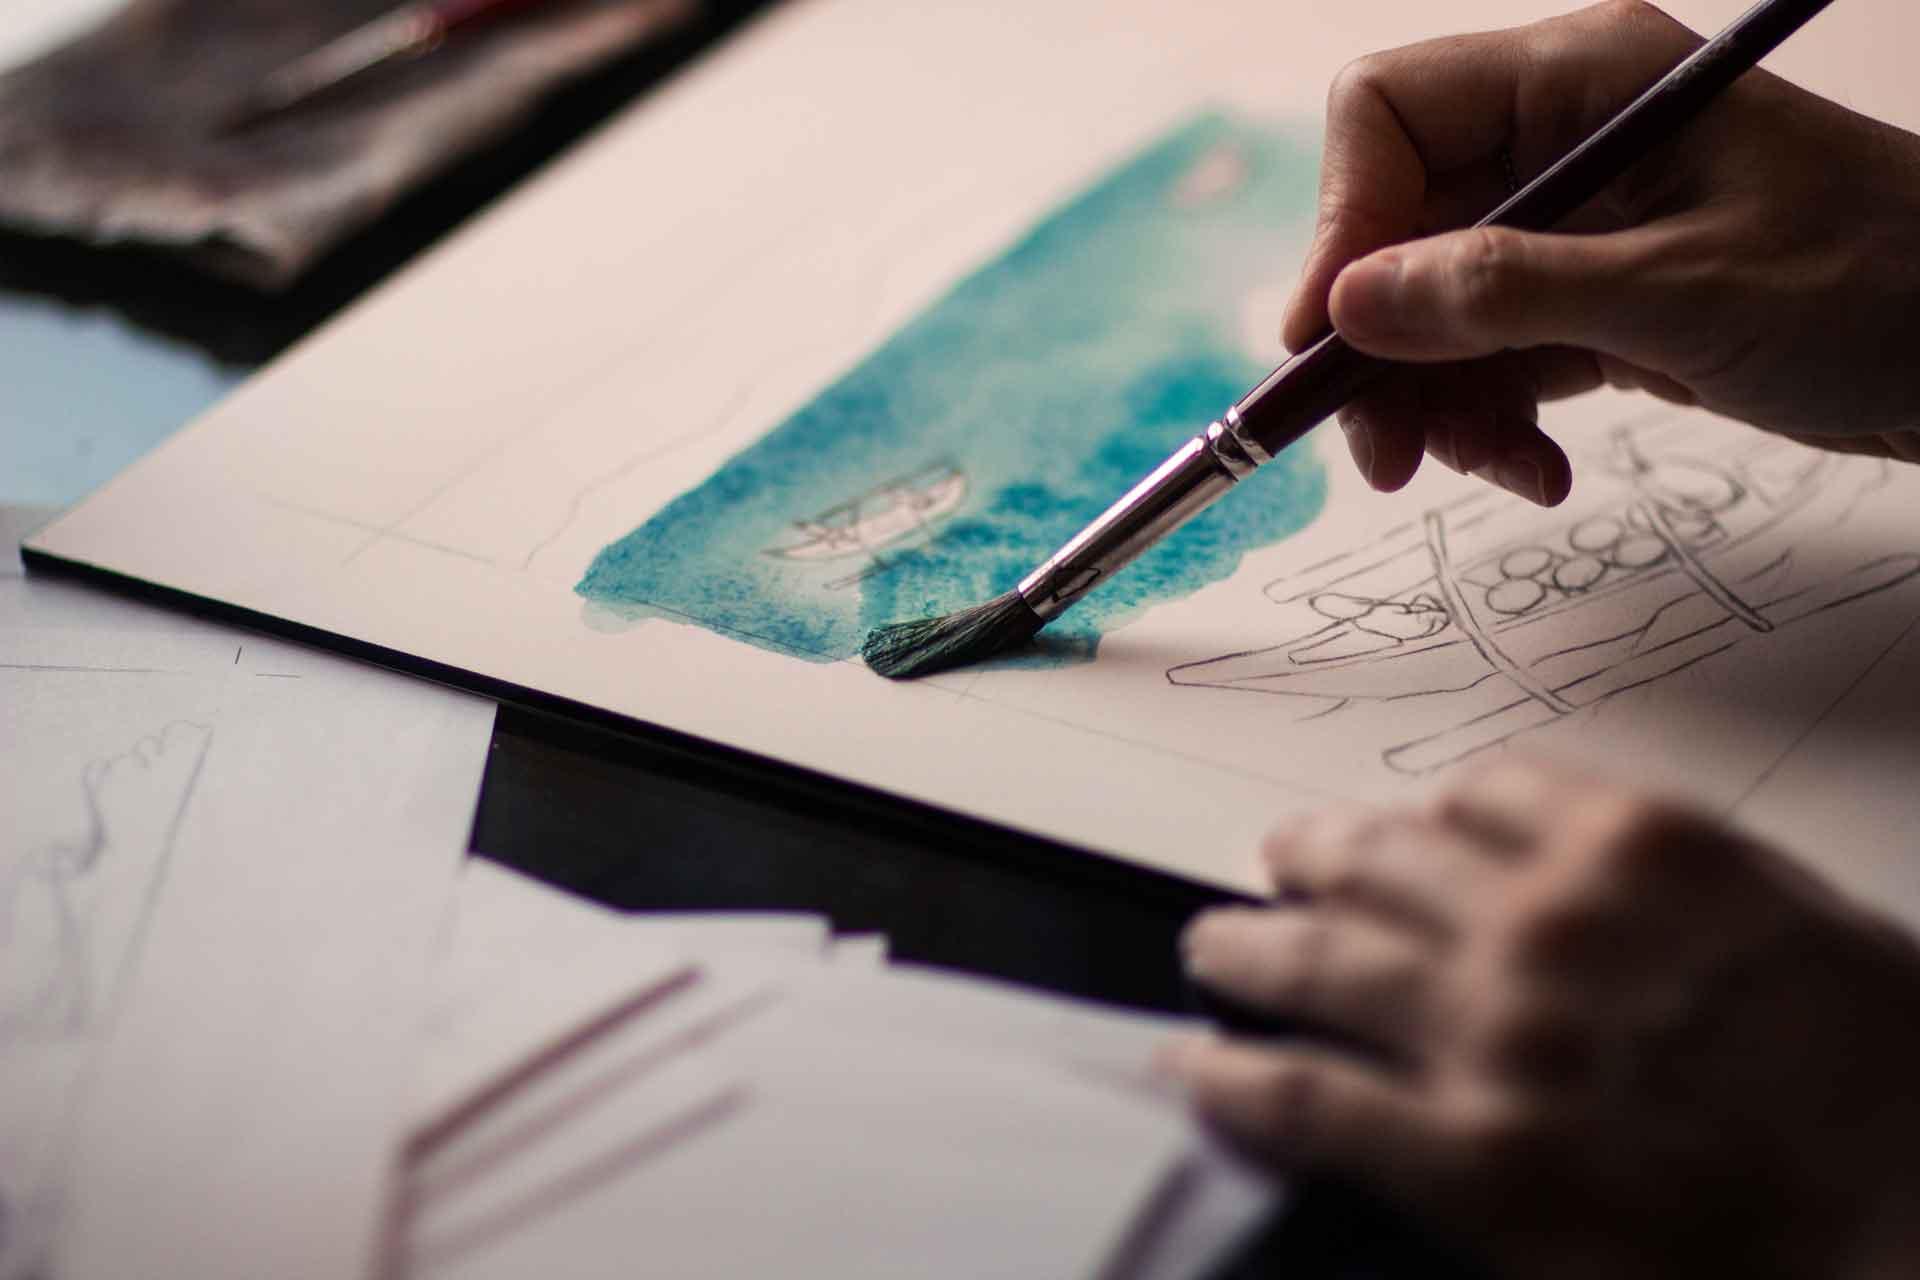 structured sketching classes Fine Arts Gurukul: Join for Structured Sketching Classes in Bangalore FineArts Gurukul Bangalore lean Sketching